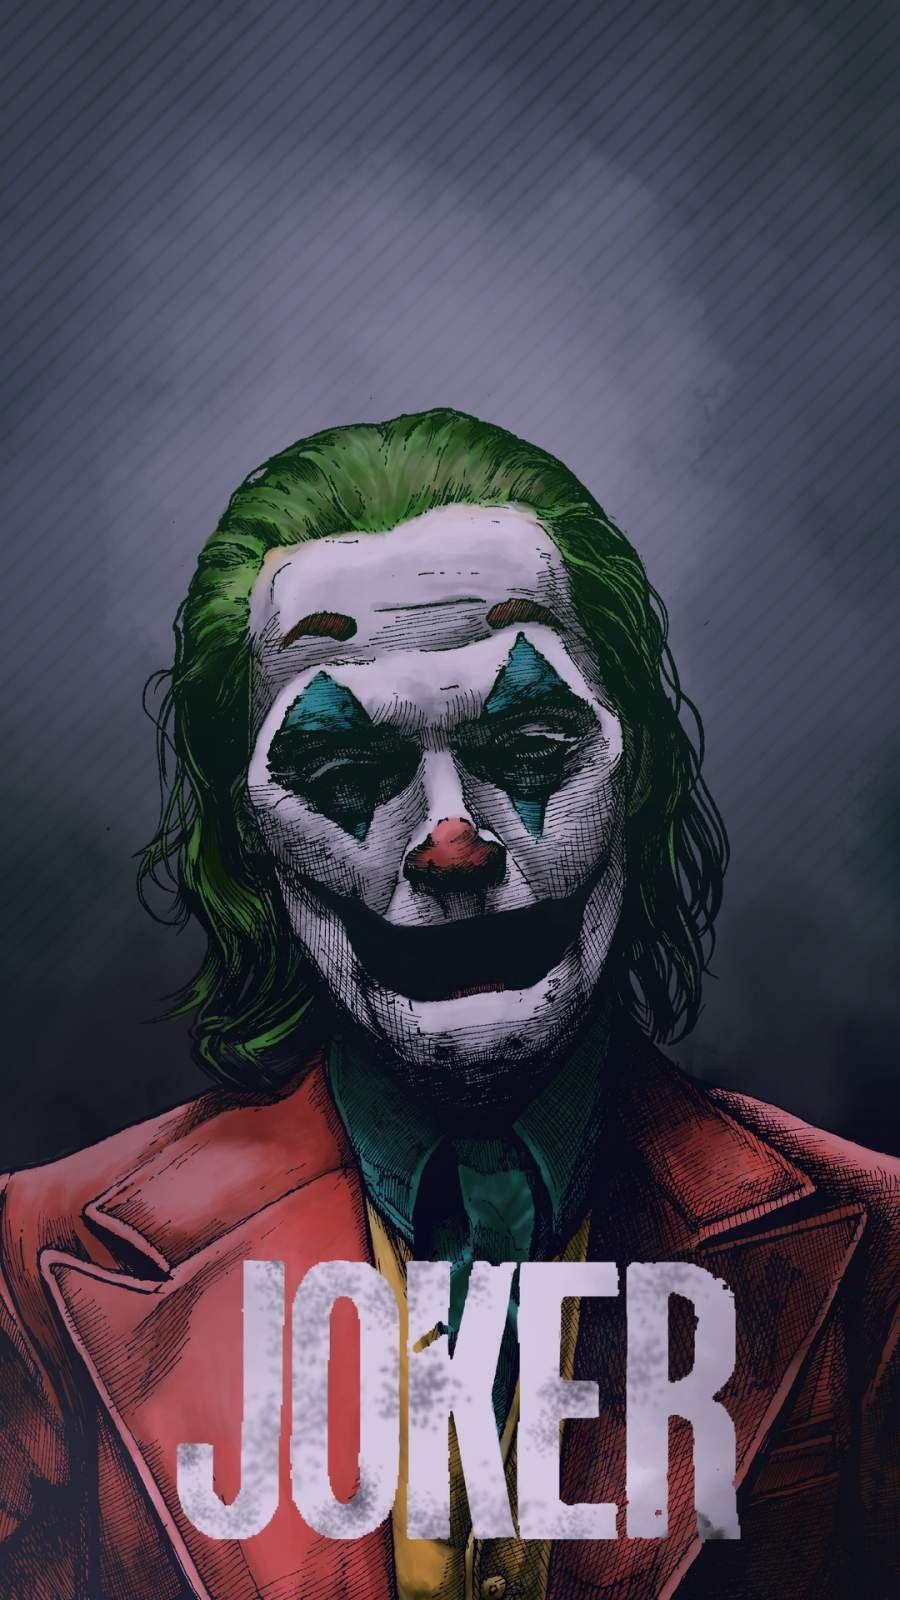 The Joker Movie iPhone Wallpaper Joker hd wallpaper Joker